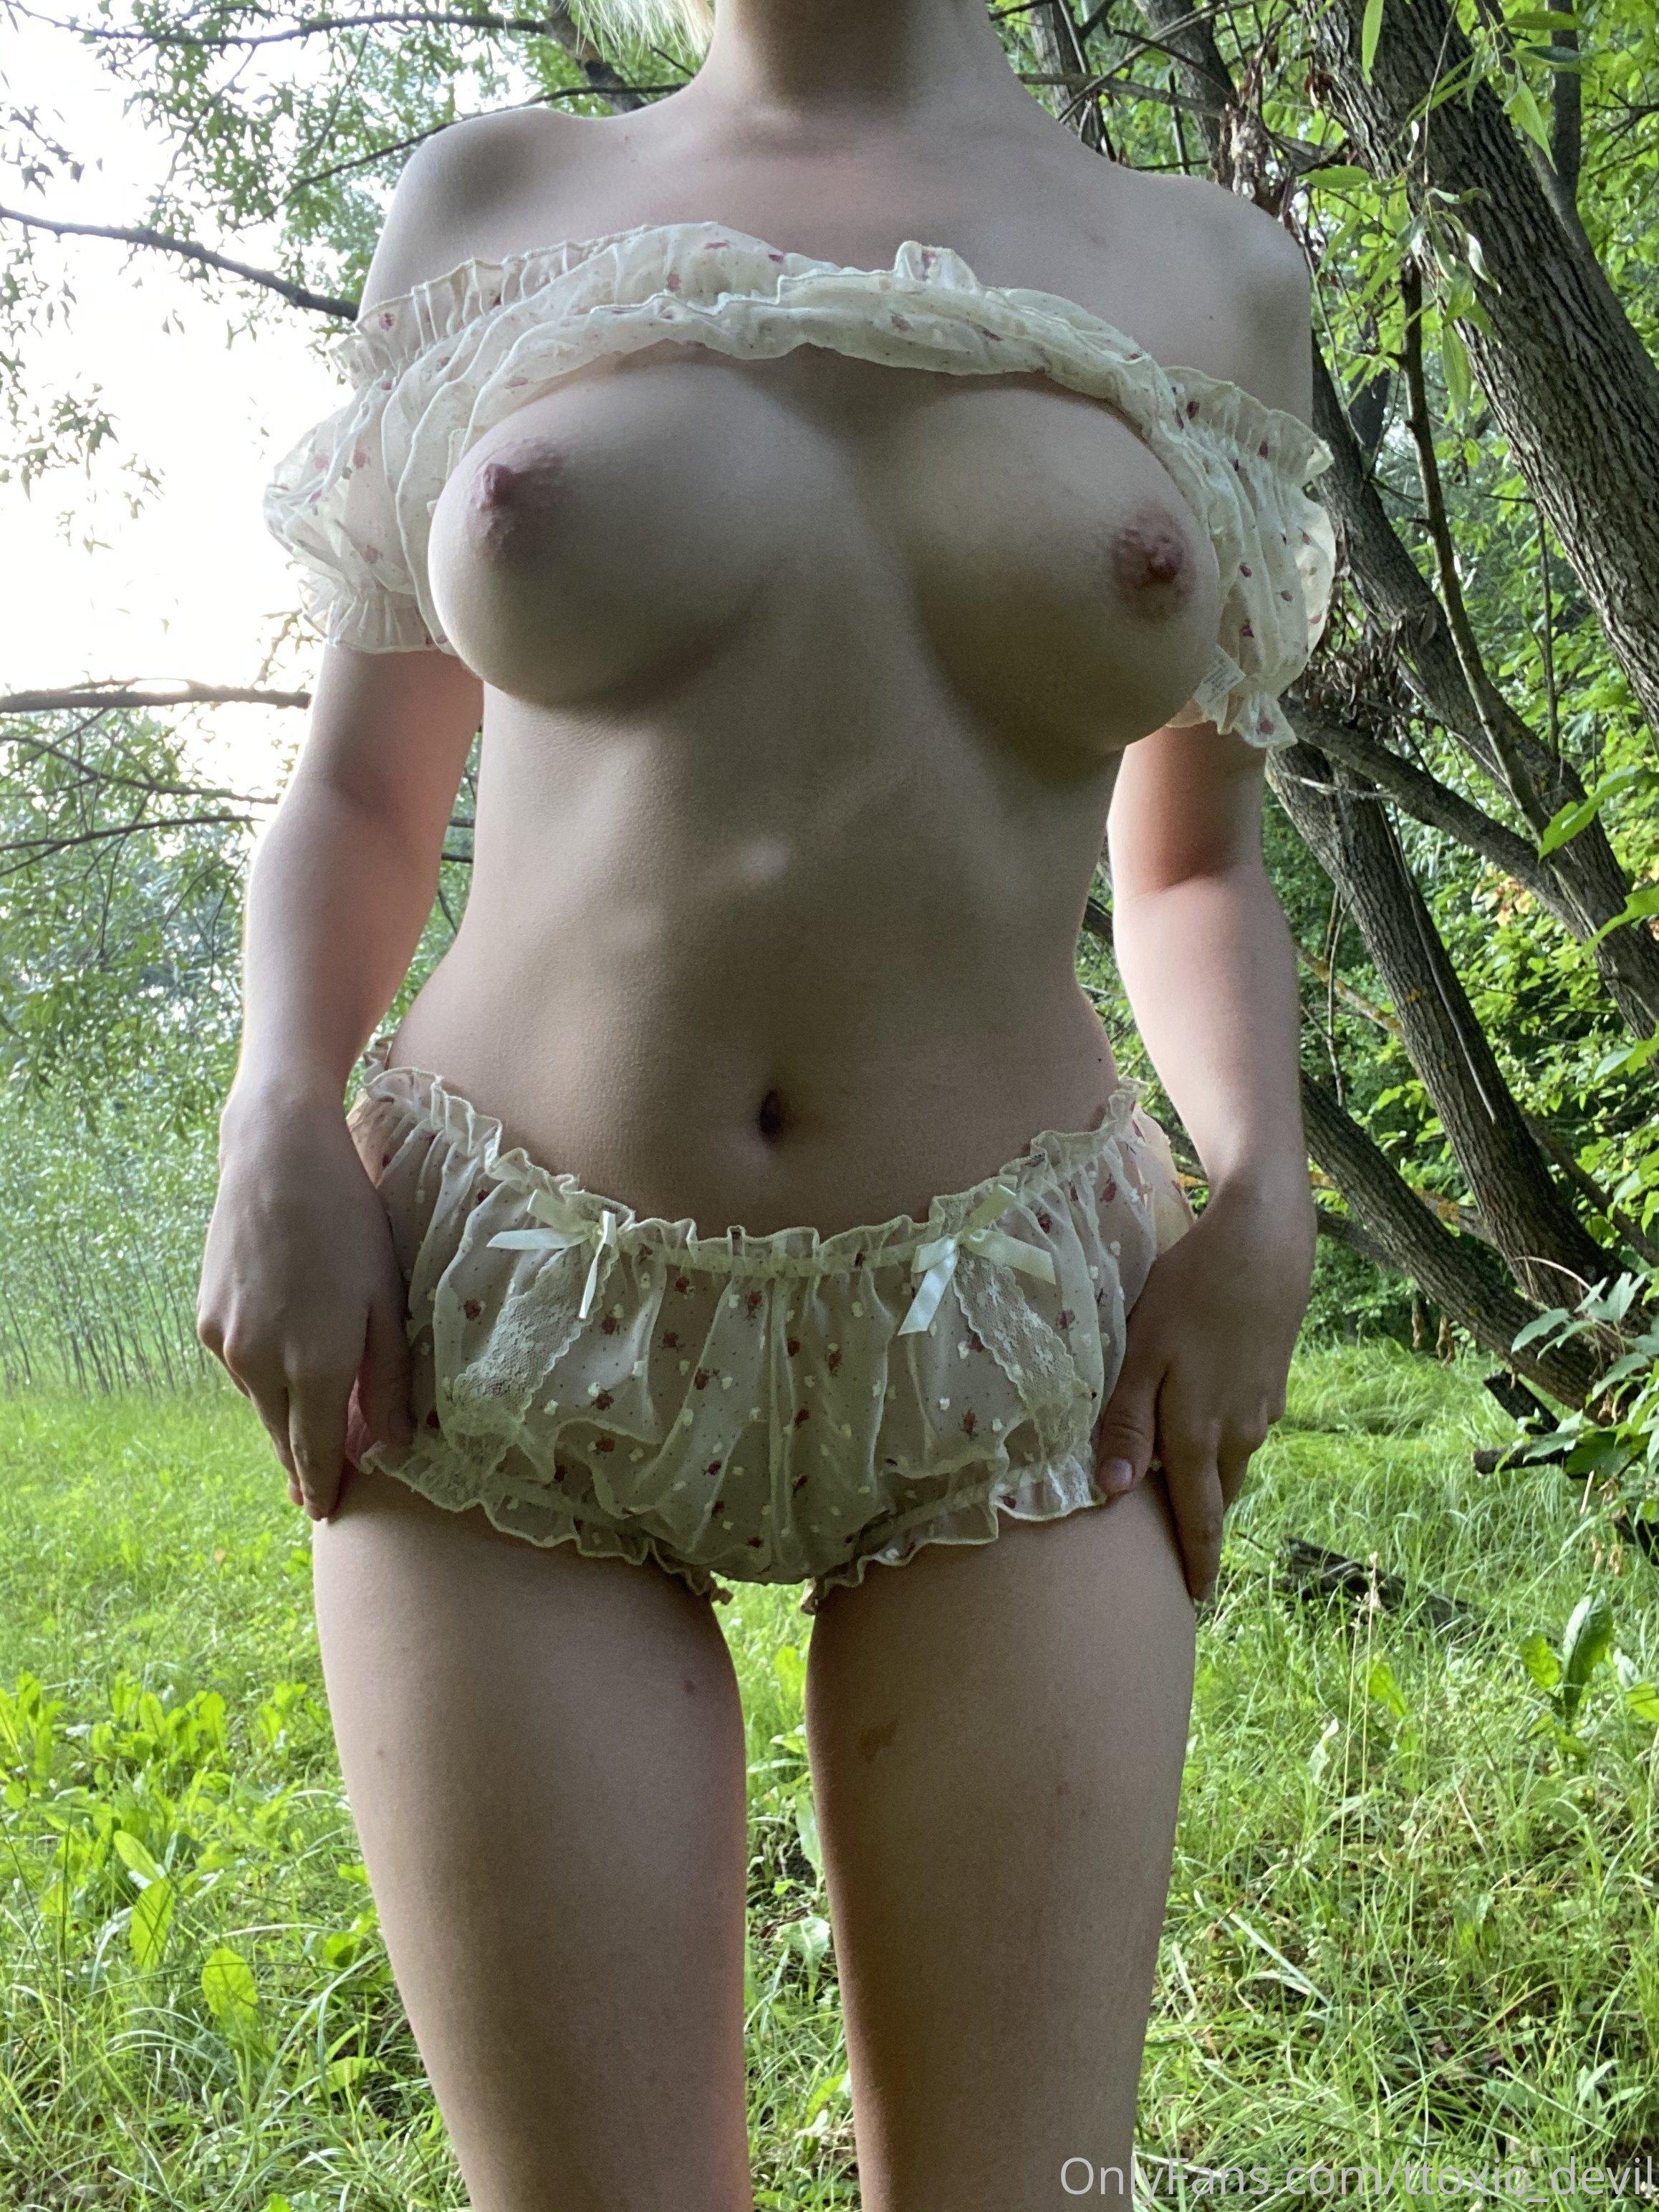 Anna, Ttoxic Devil, Onlyfans 0111